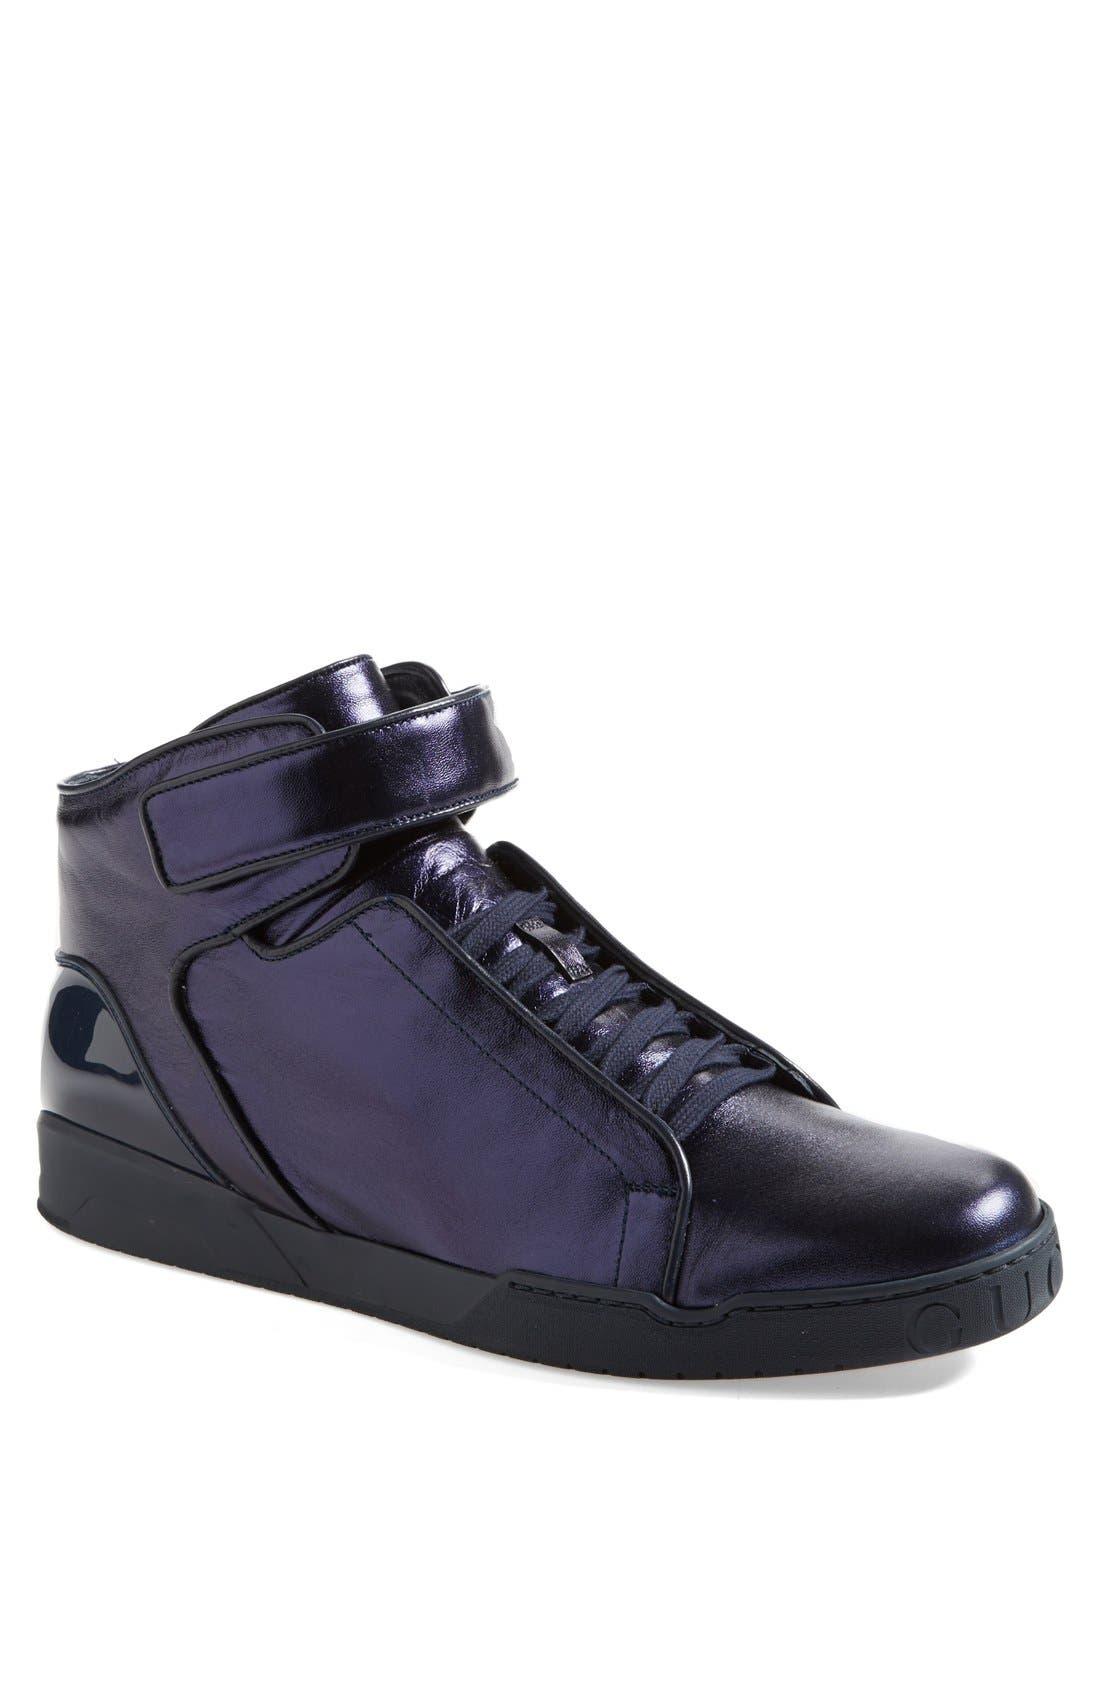 Alternate Image 1 Selected - Gucci 'Mel Mid' Metallic Sneaker